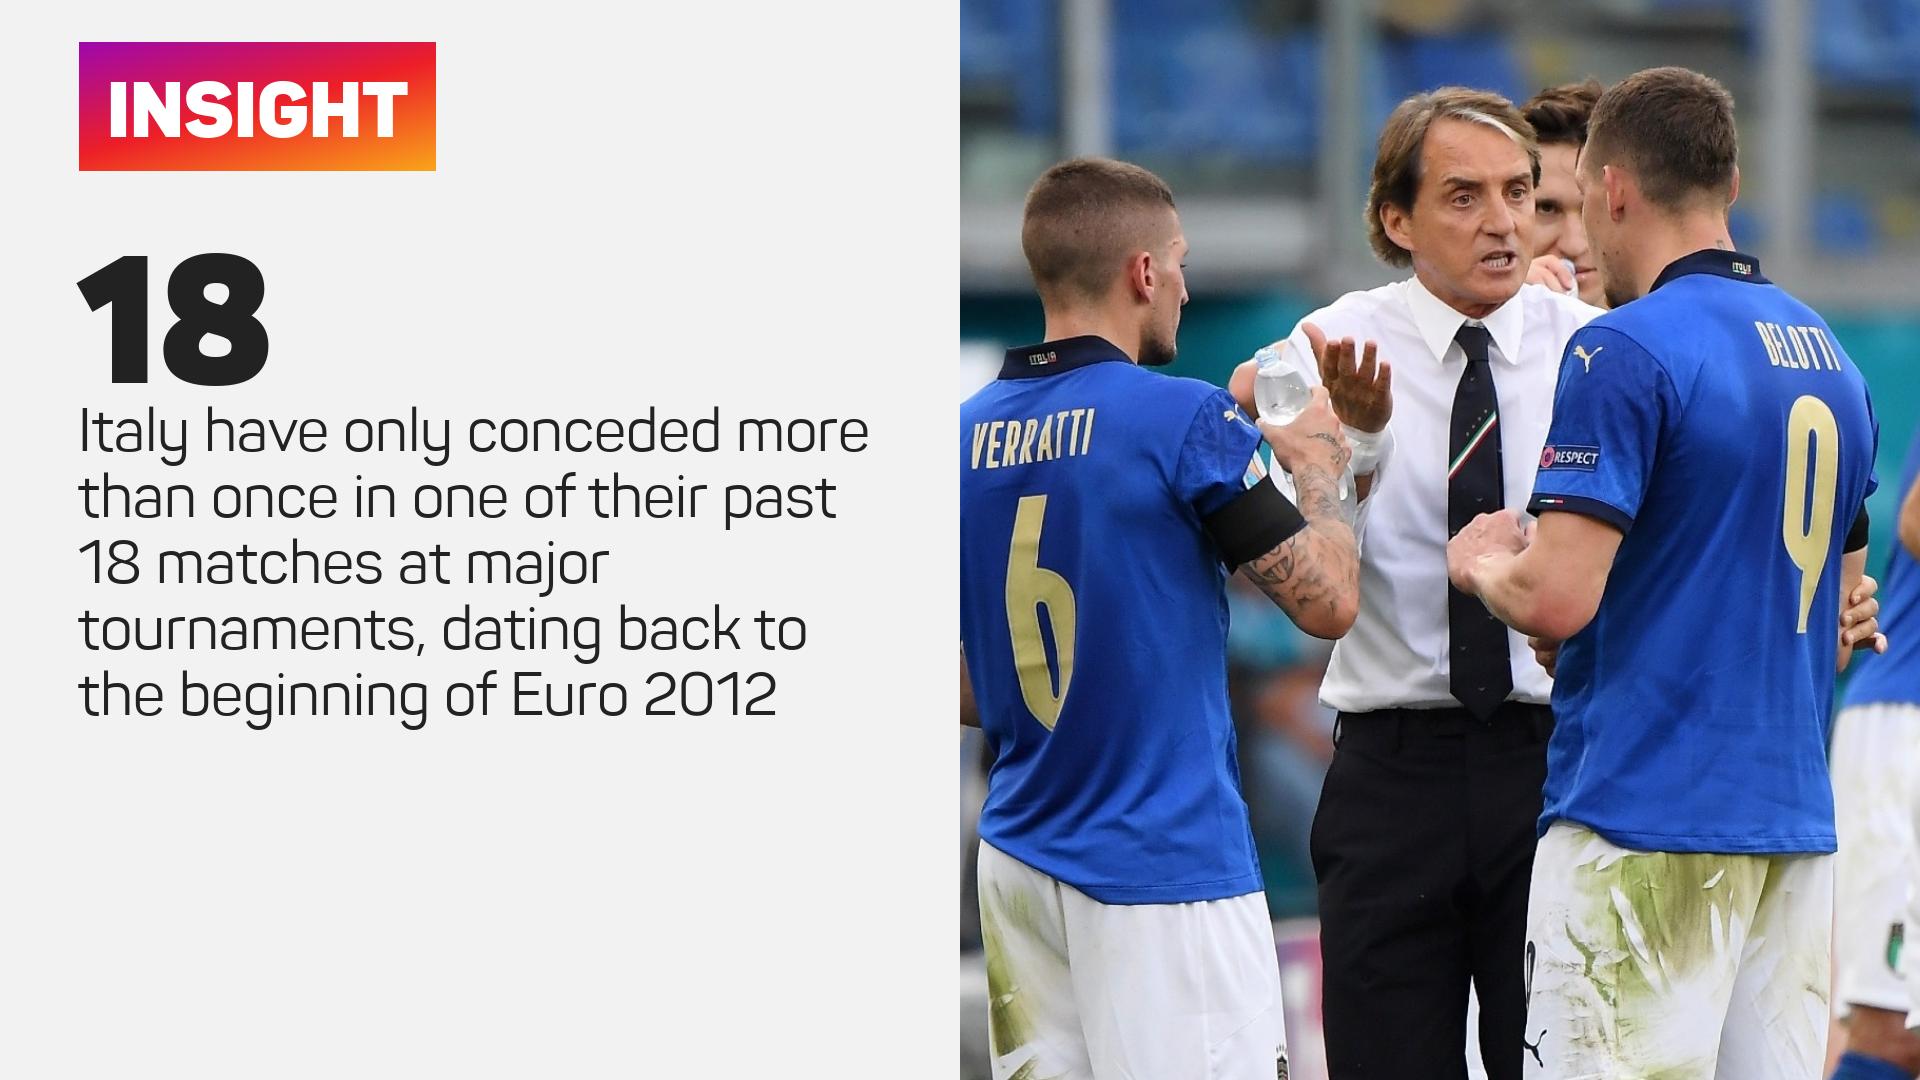 Italy defensive statat major tournaments